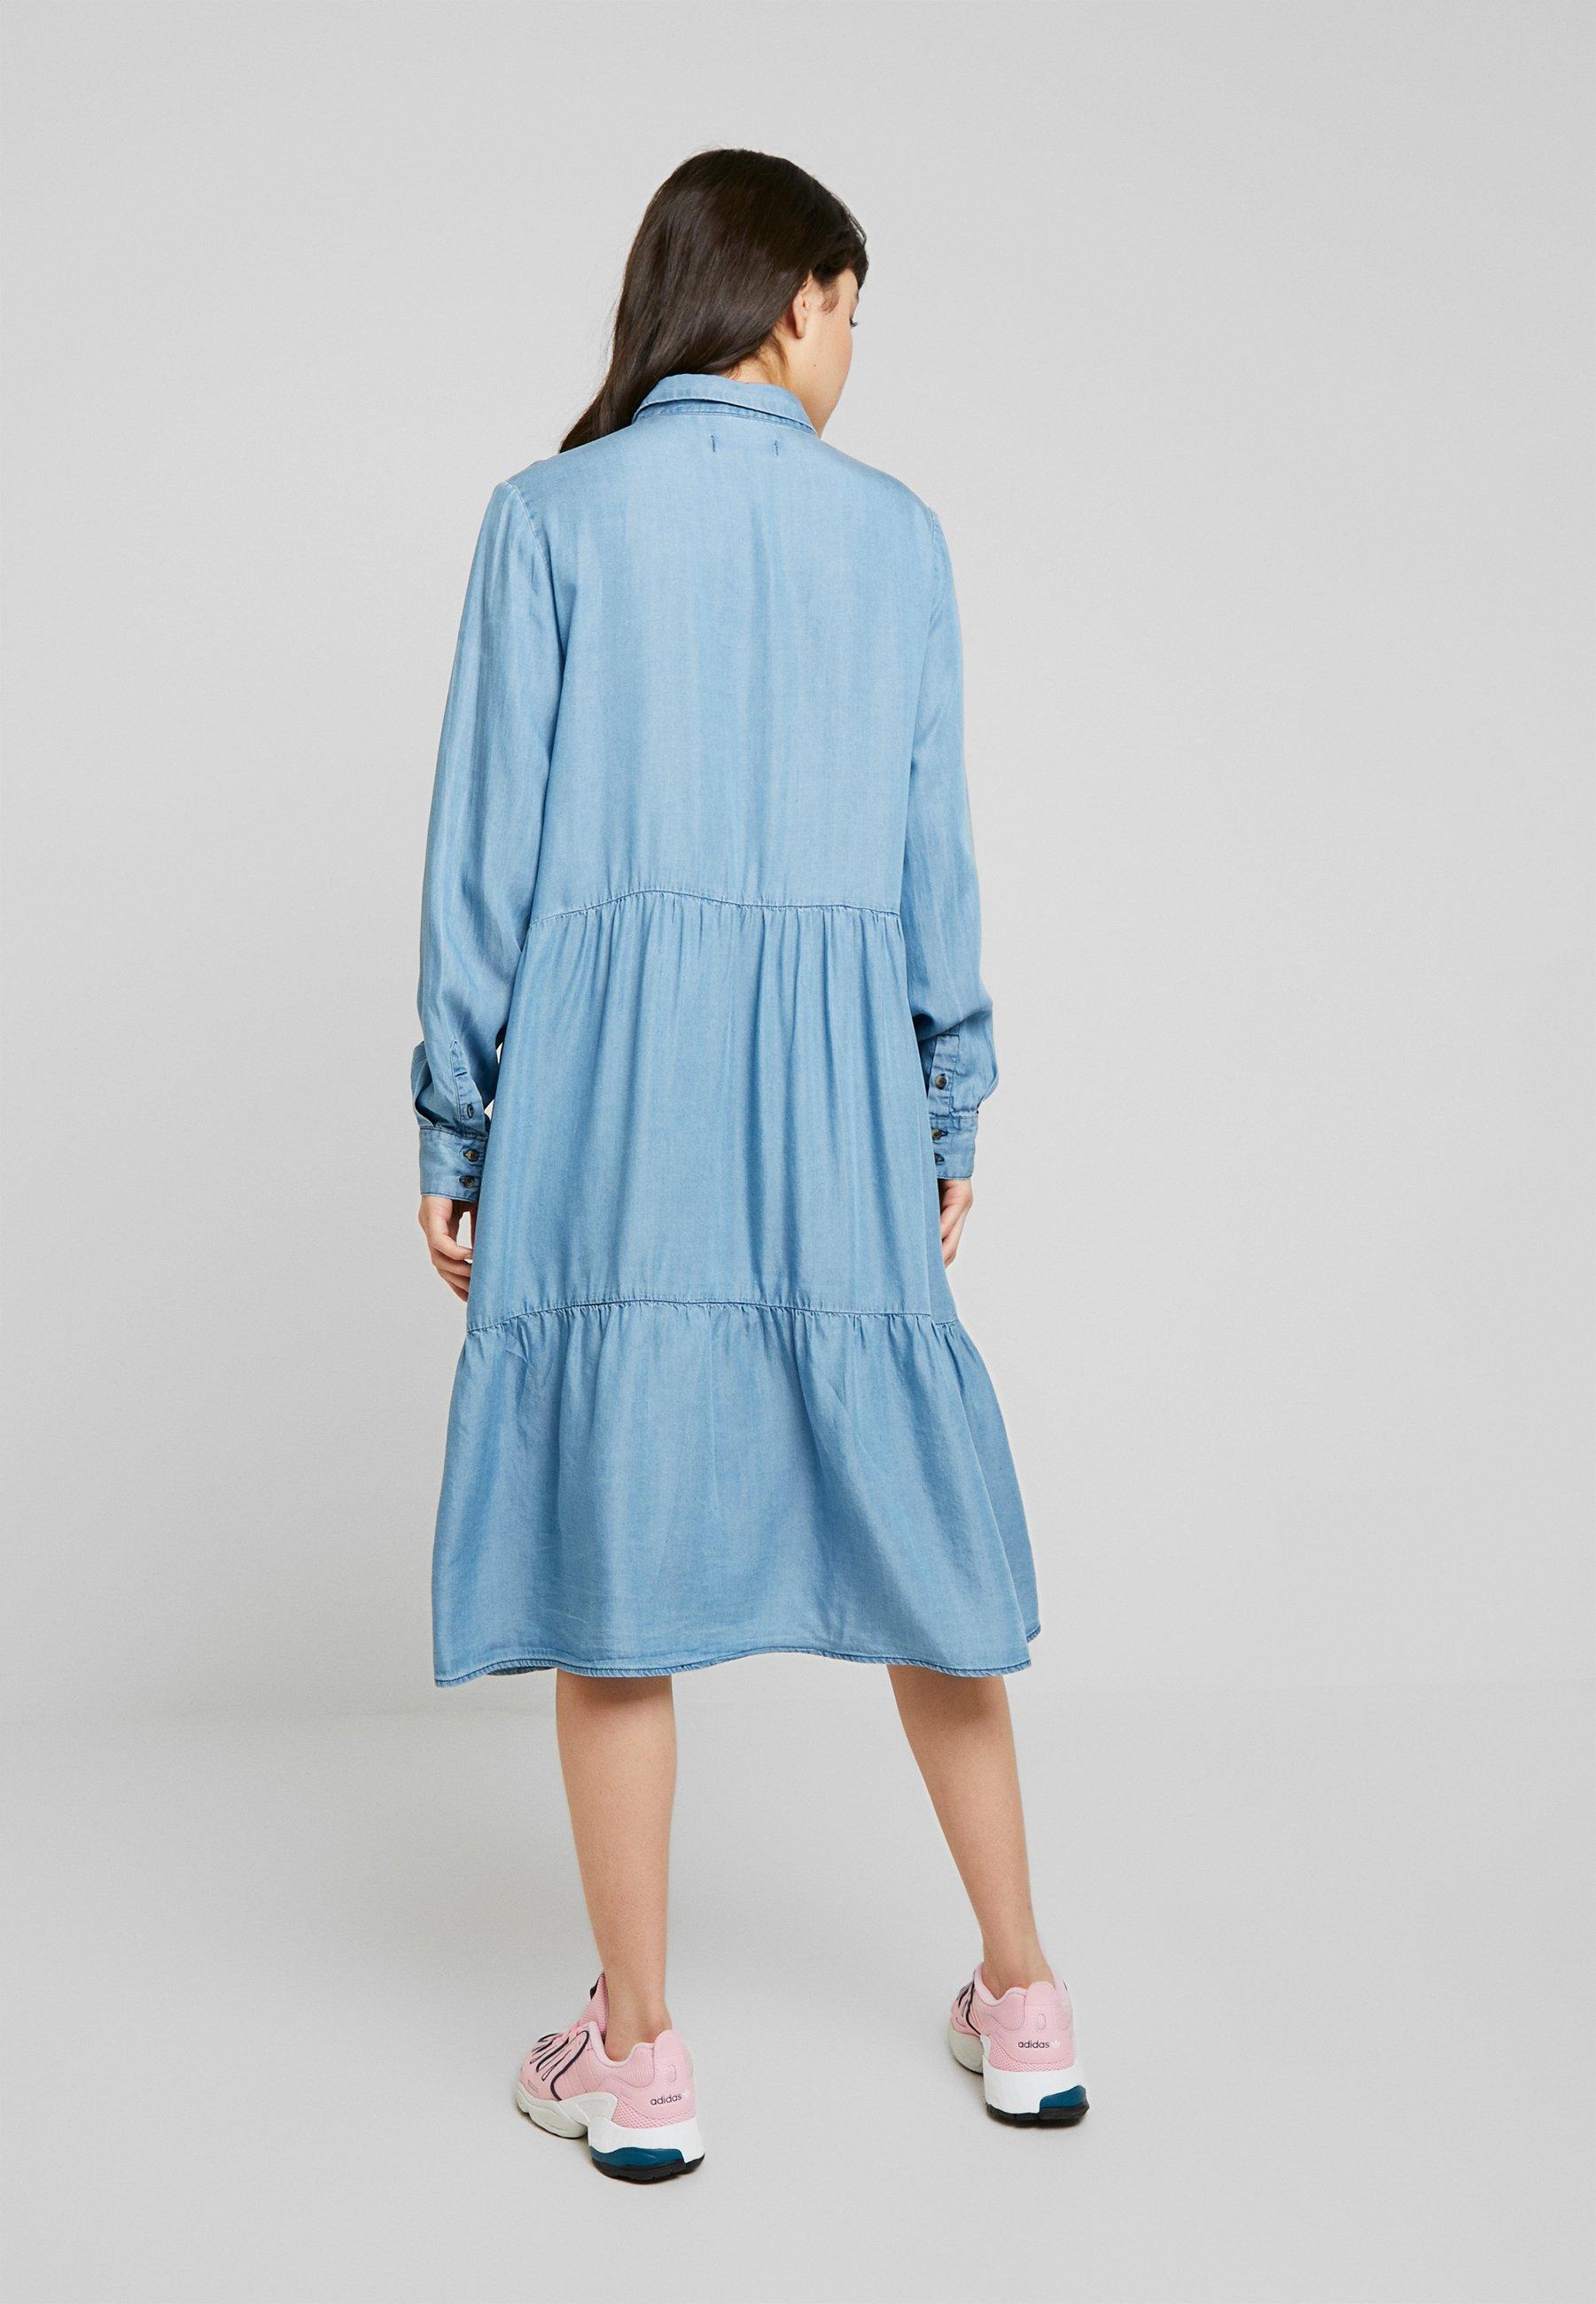 Soft Rebels Moira Ls Dress - Robe Chemise Dark Blue f56Z4bI